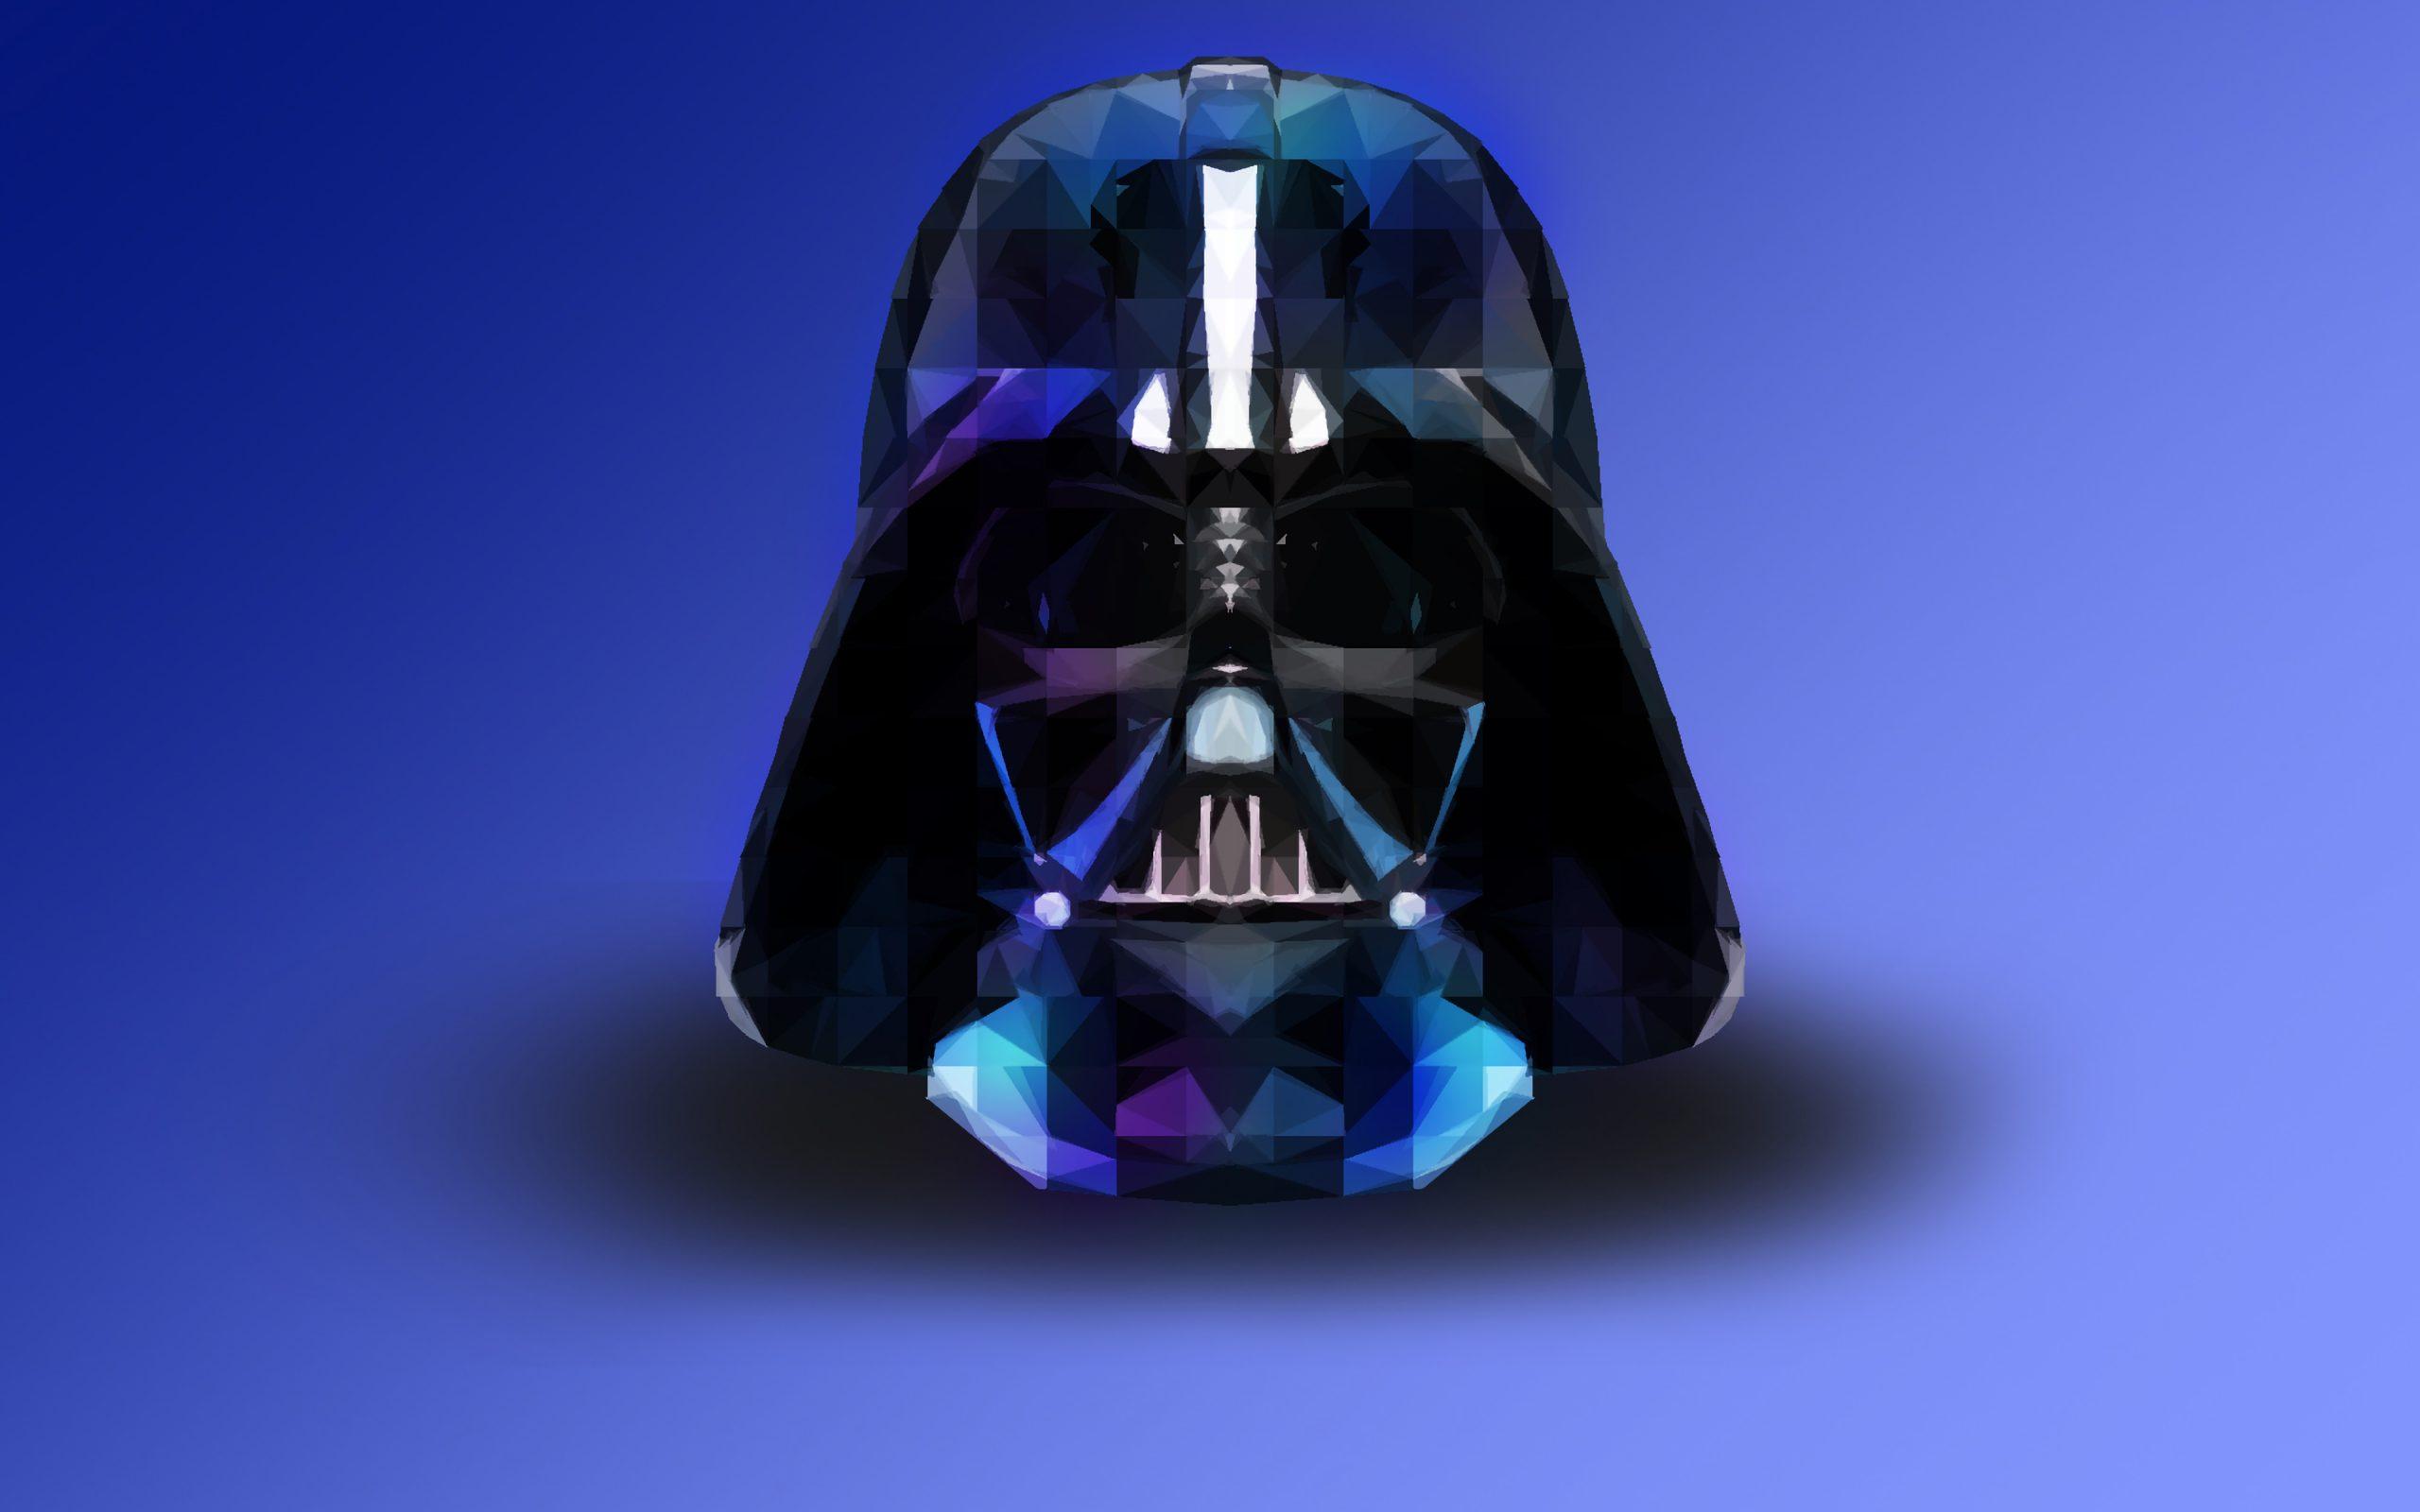 Darth Vader Star Wars Abstract 4k Wallpaper Best Wallpapers